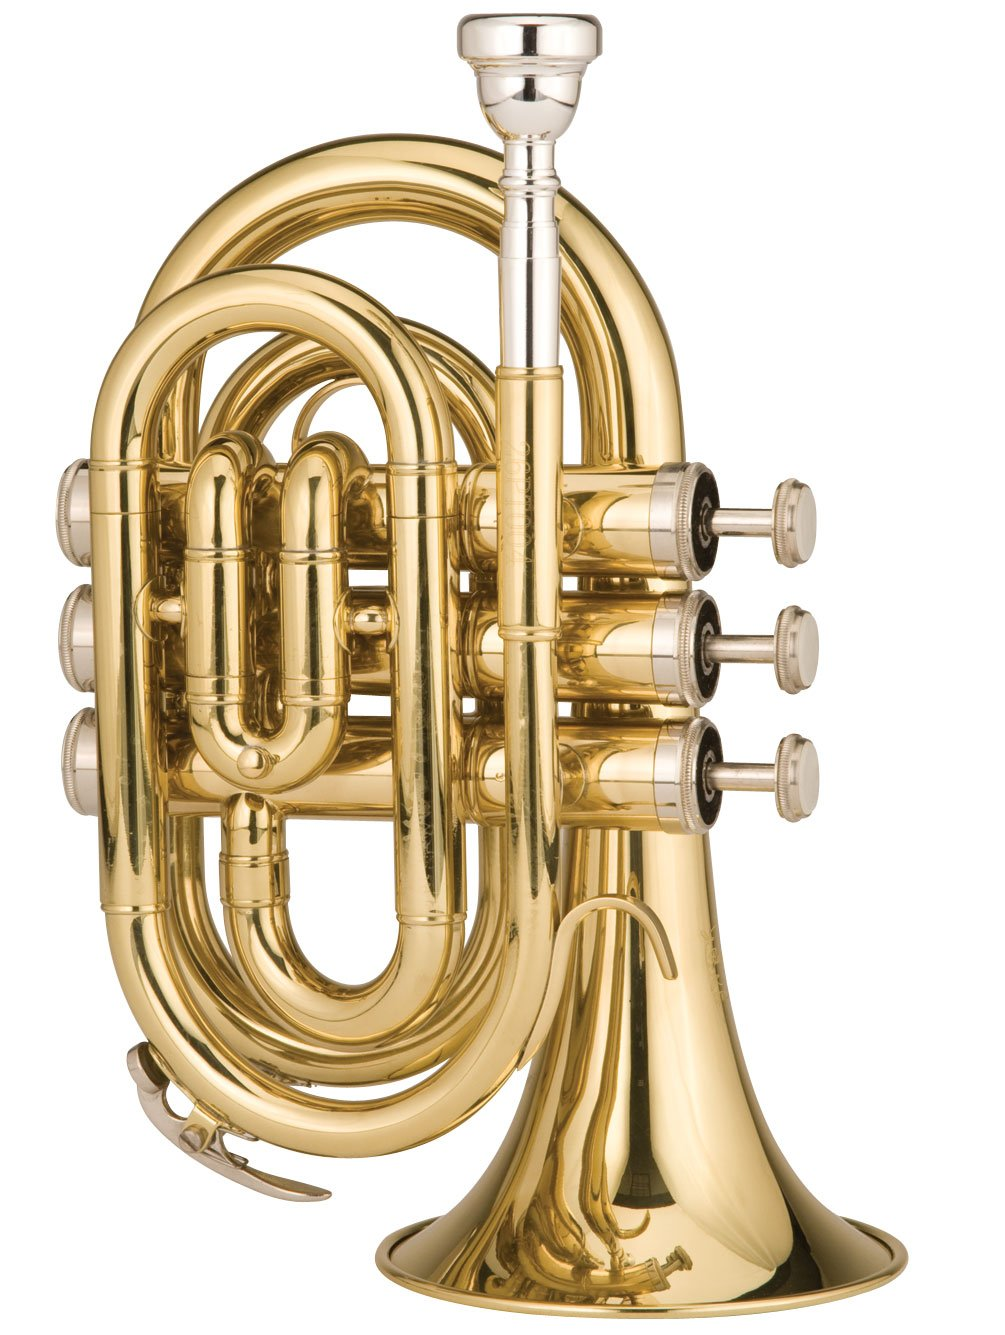 Ravel RPKT1 Pocket Trumpet Brass